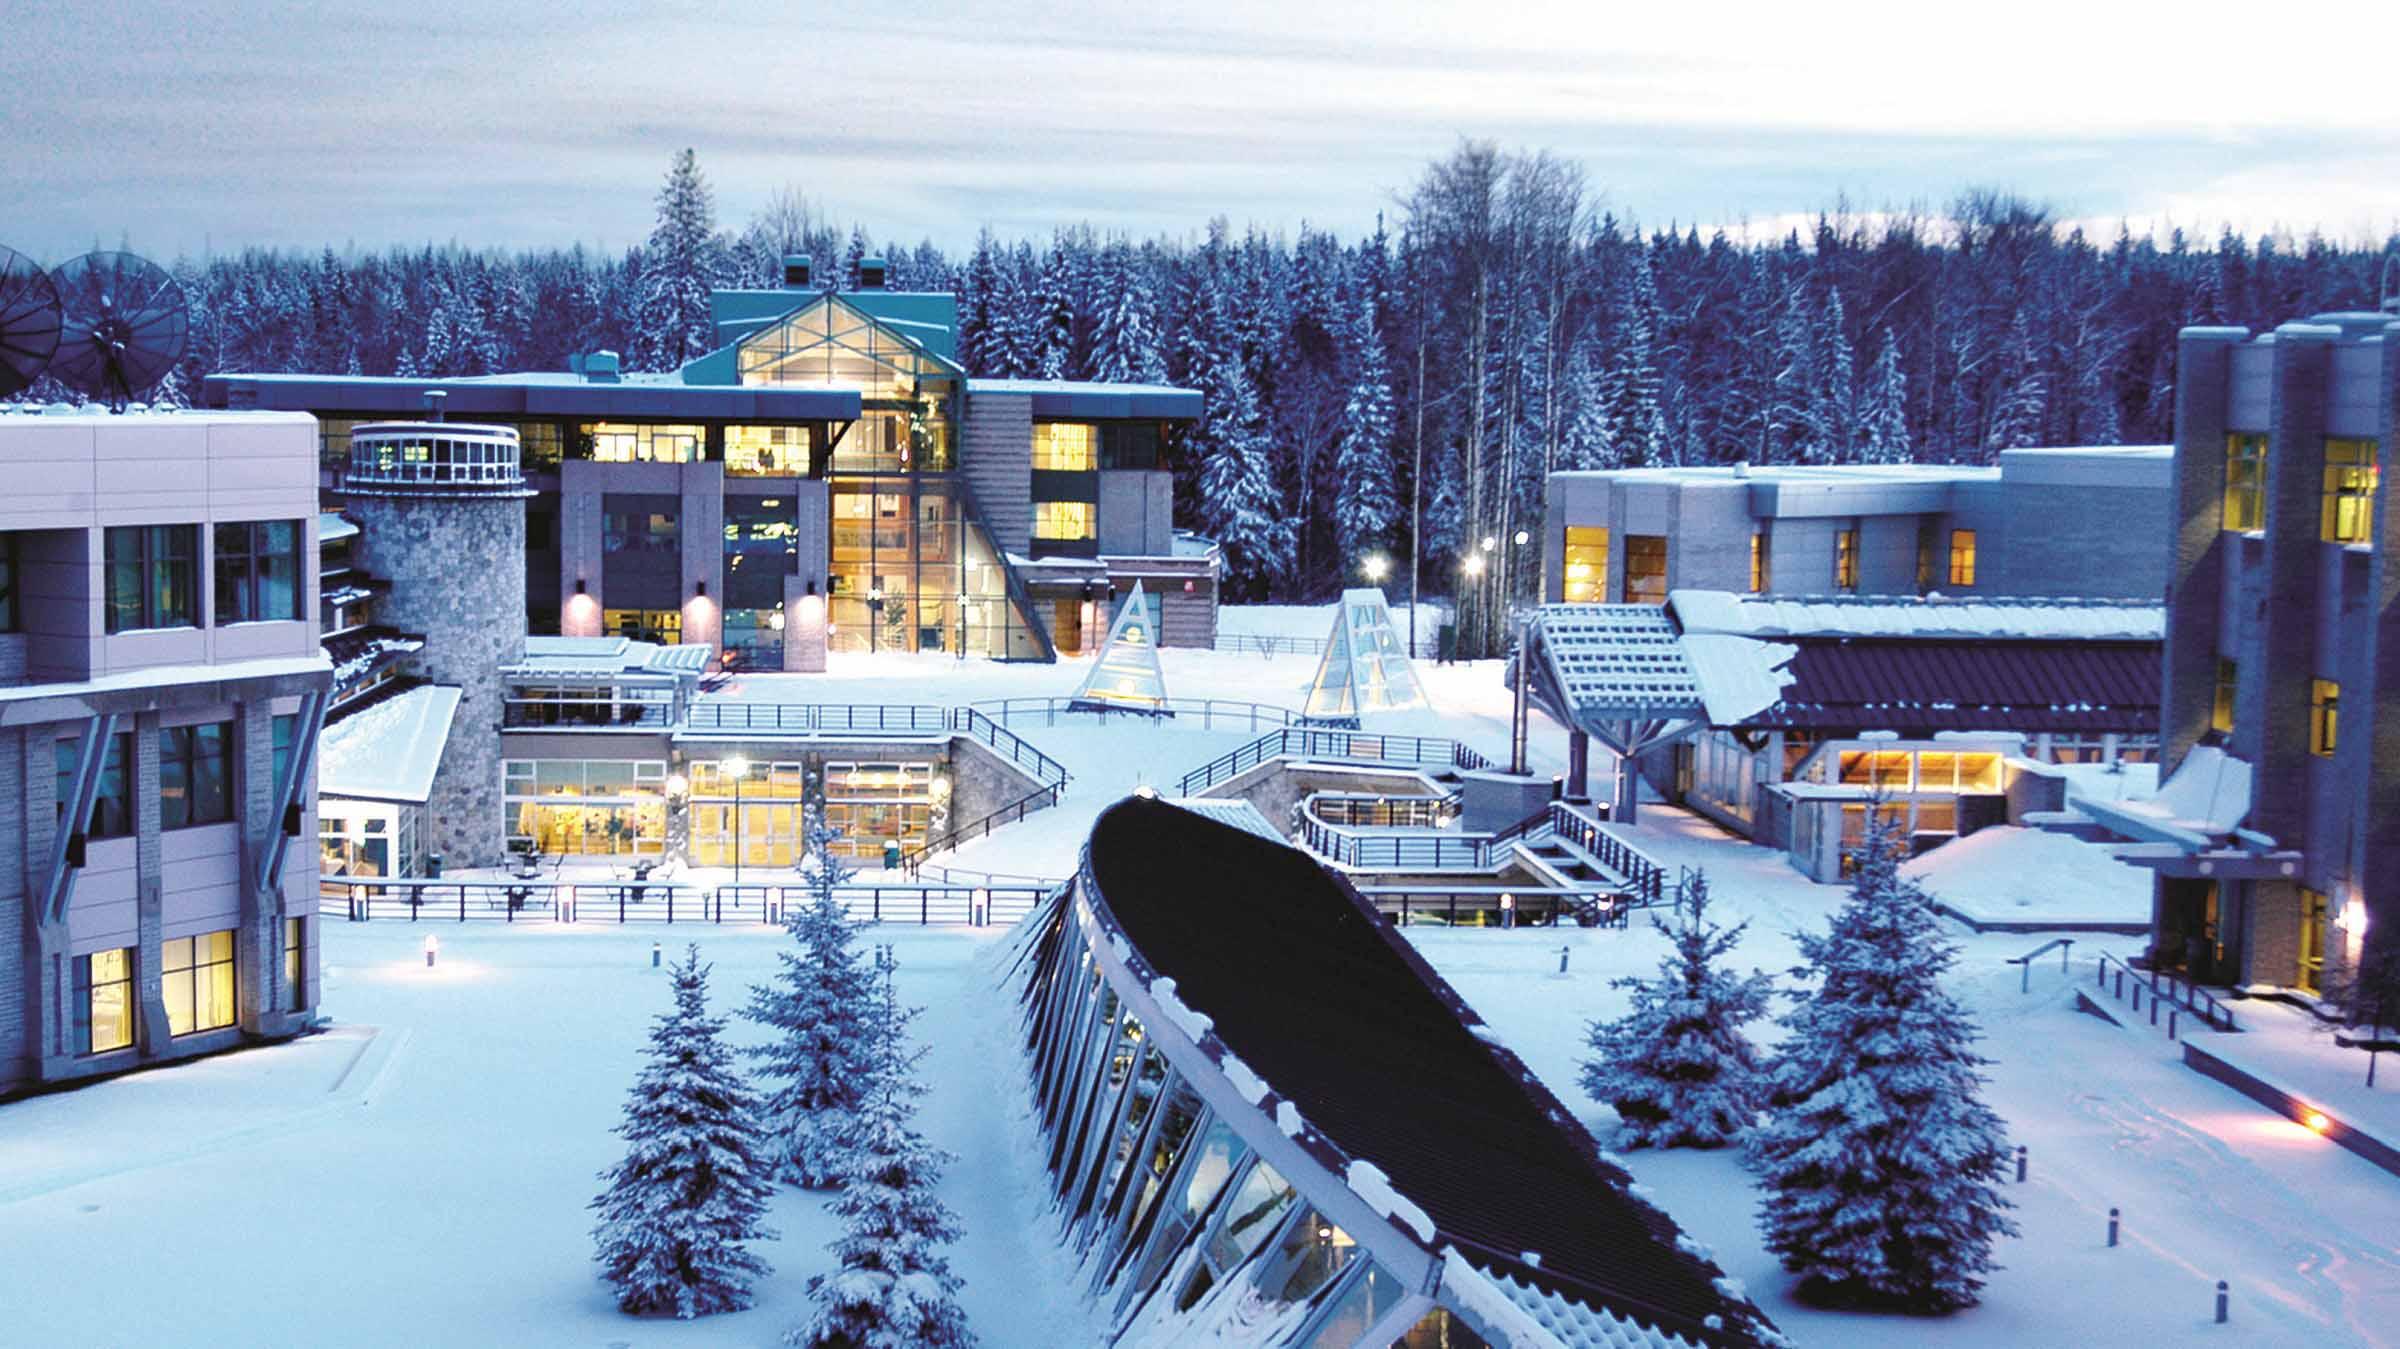 University of Northern British Columbia during Winter